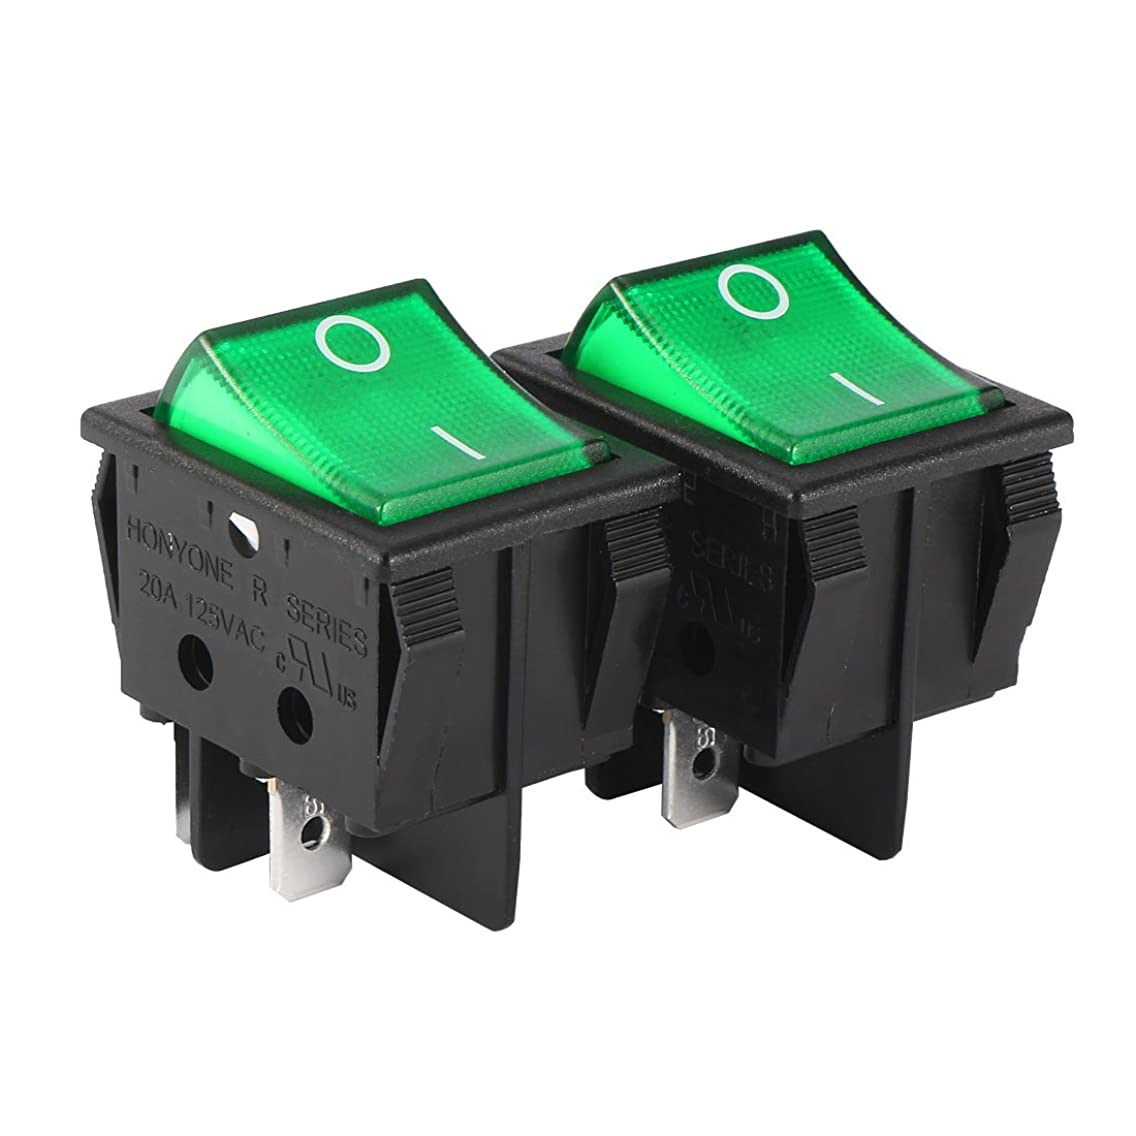 uxcell 2Pcs DPST On Off 4Pin ON/OFF Green LED Light Boat Lights Rocker Switch Push Button switch AC 20A/125V 22A/250V